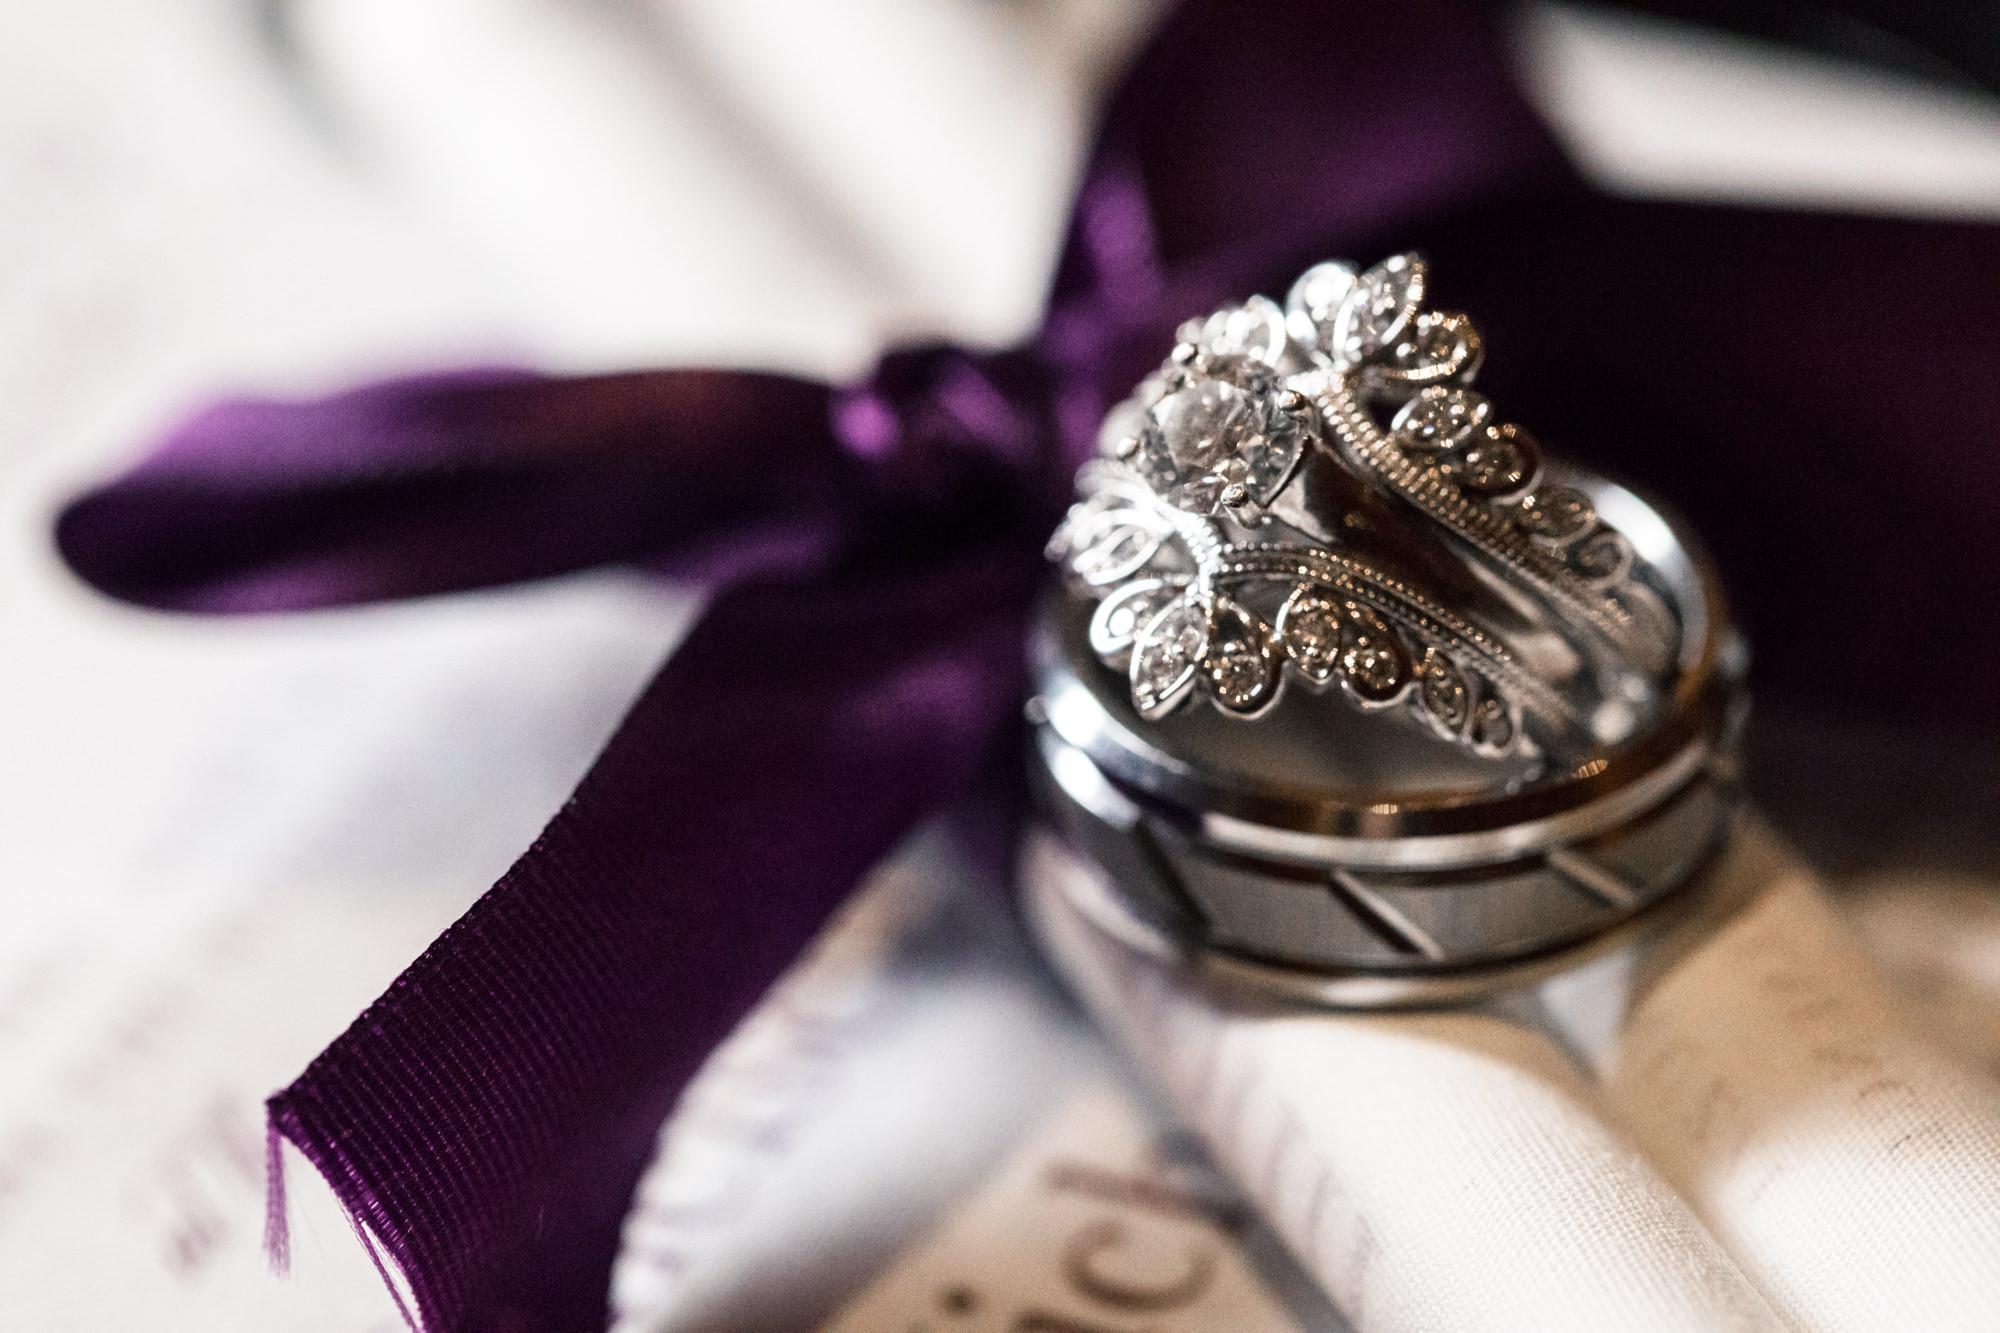 Benvenuto_Wedding_catholic_Florida_Bride-Groom-132.jpg